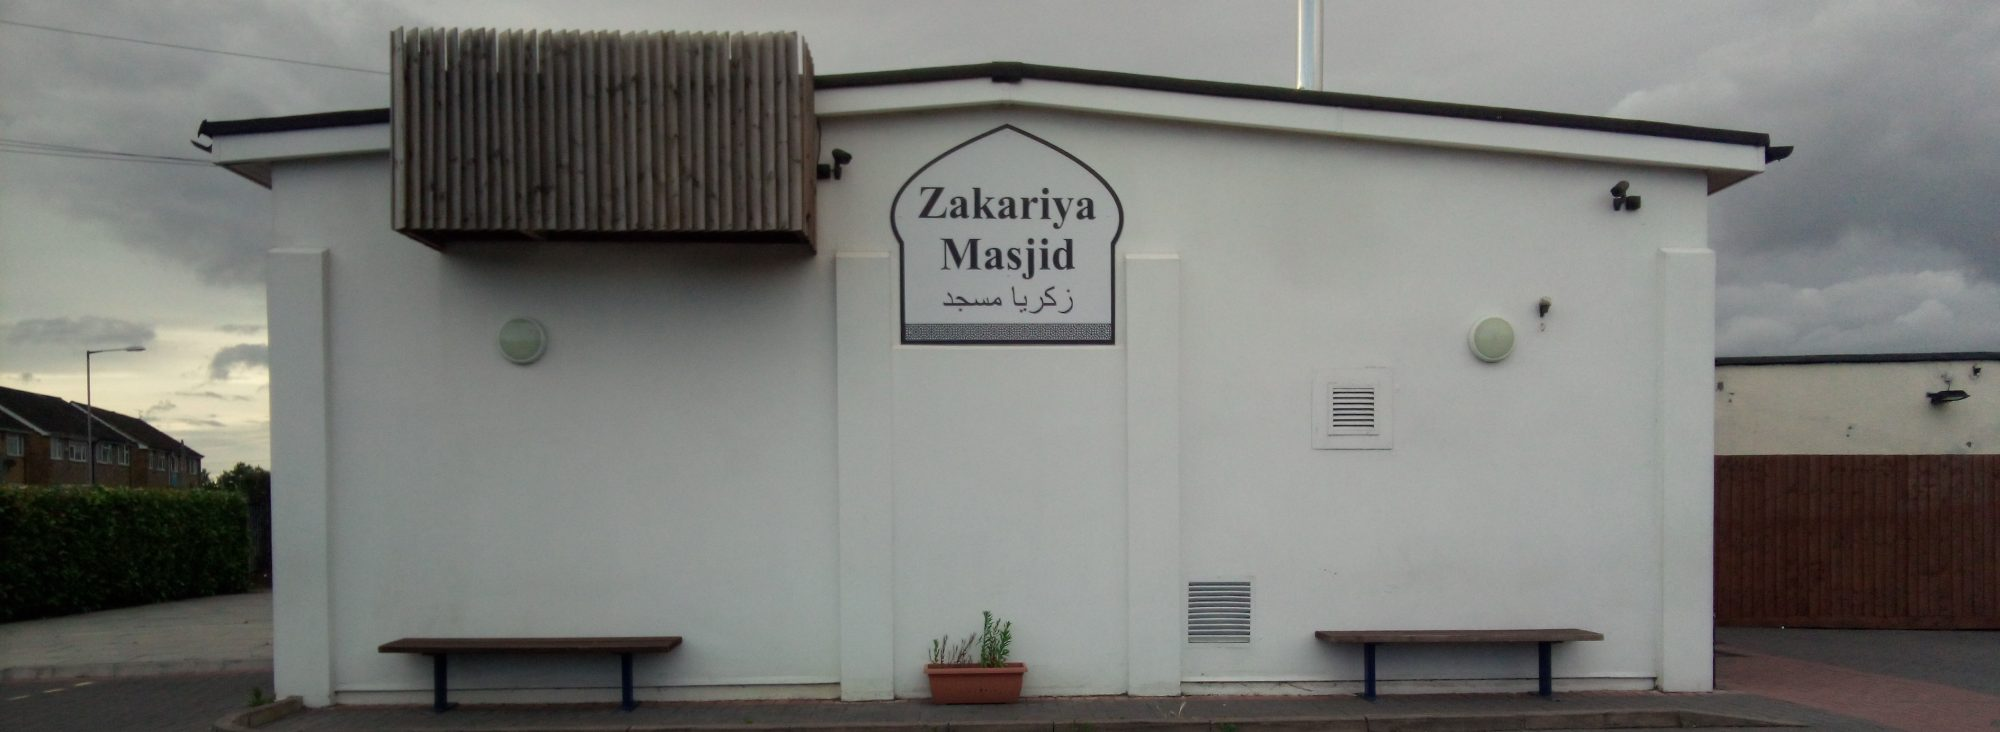 Zakariya Masjid